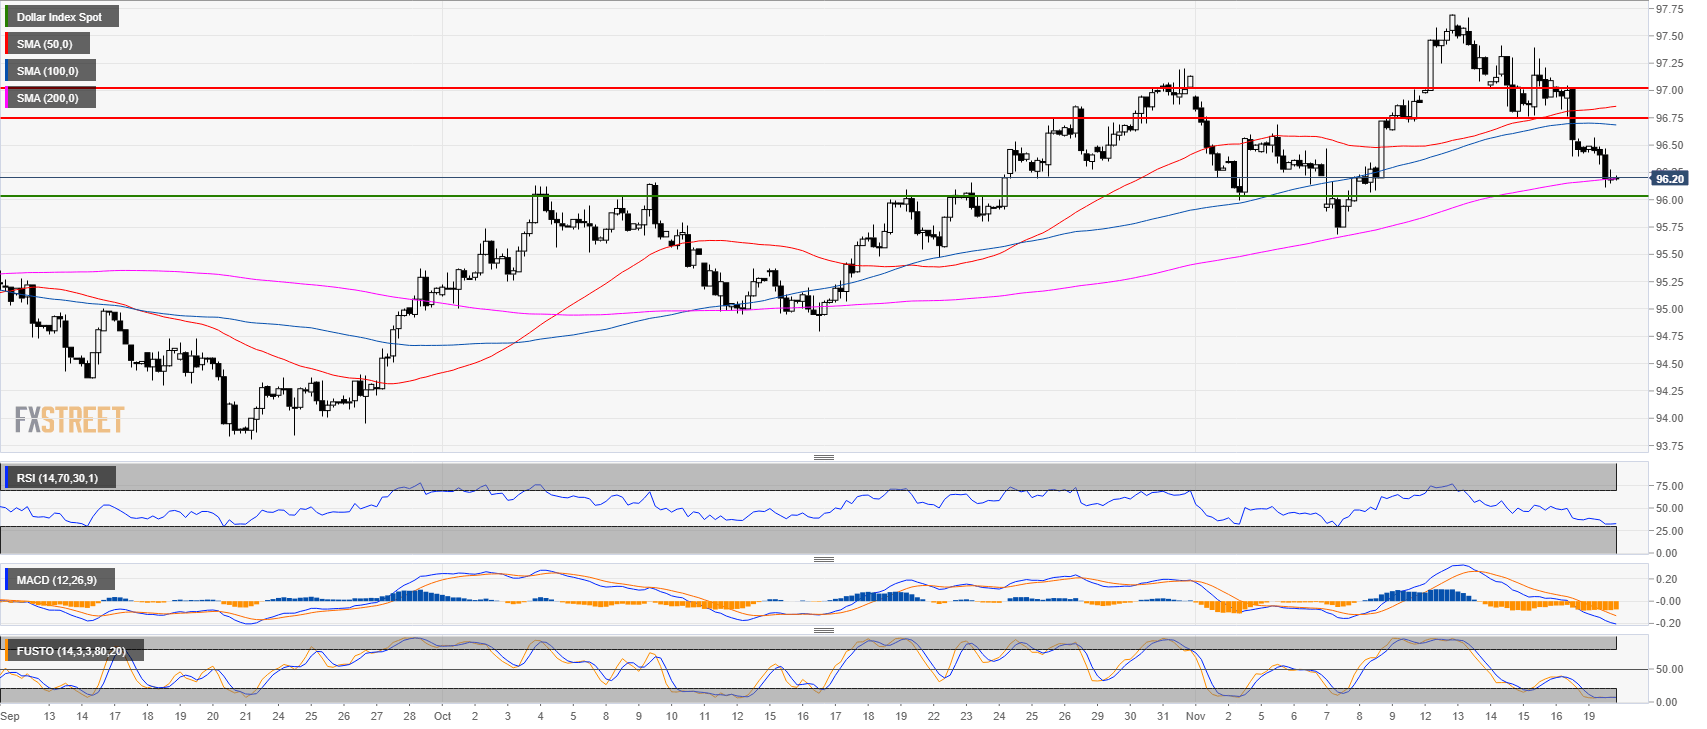 US Dollar Index Technical Analysis: Elliott wave pattern is